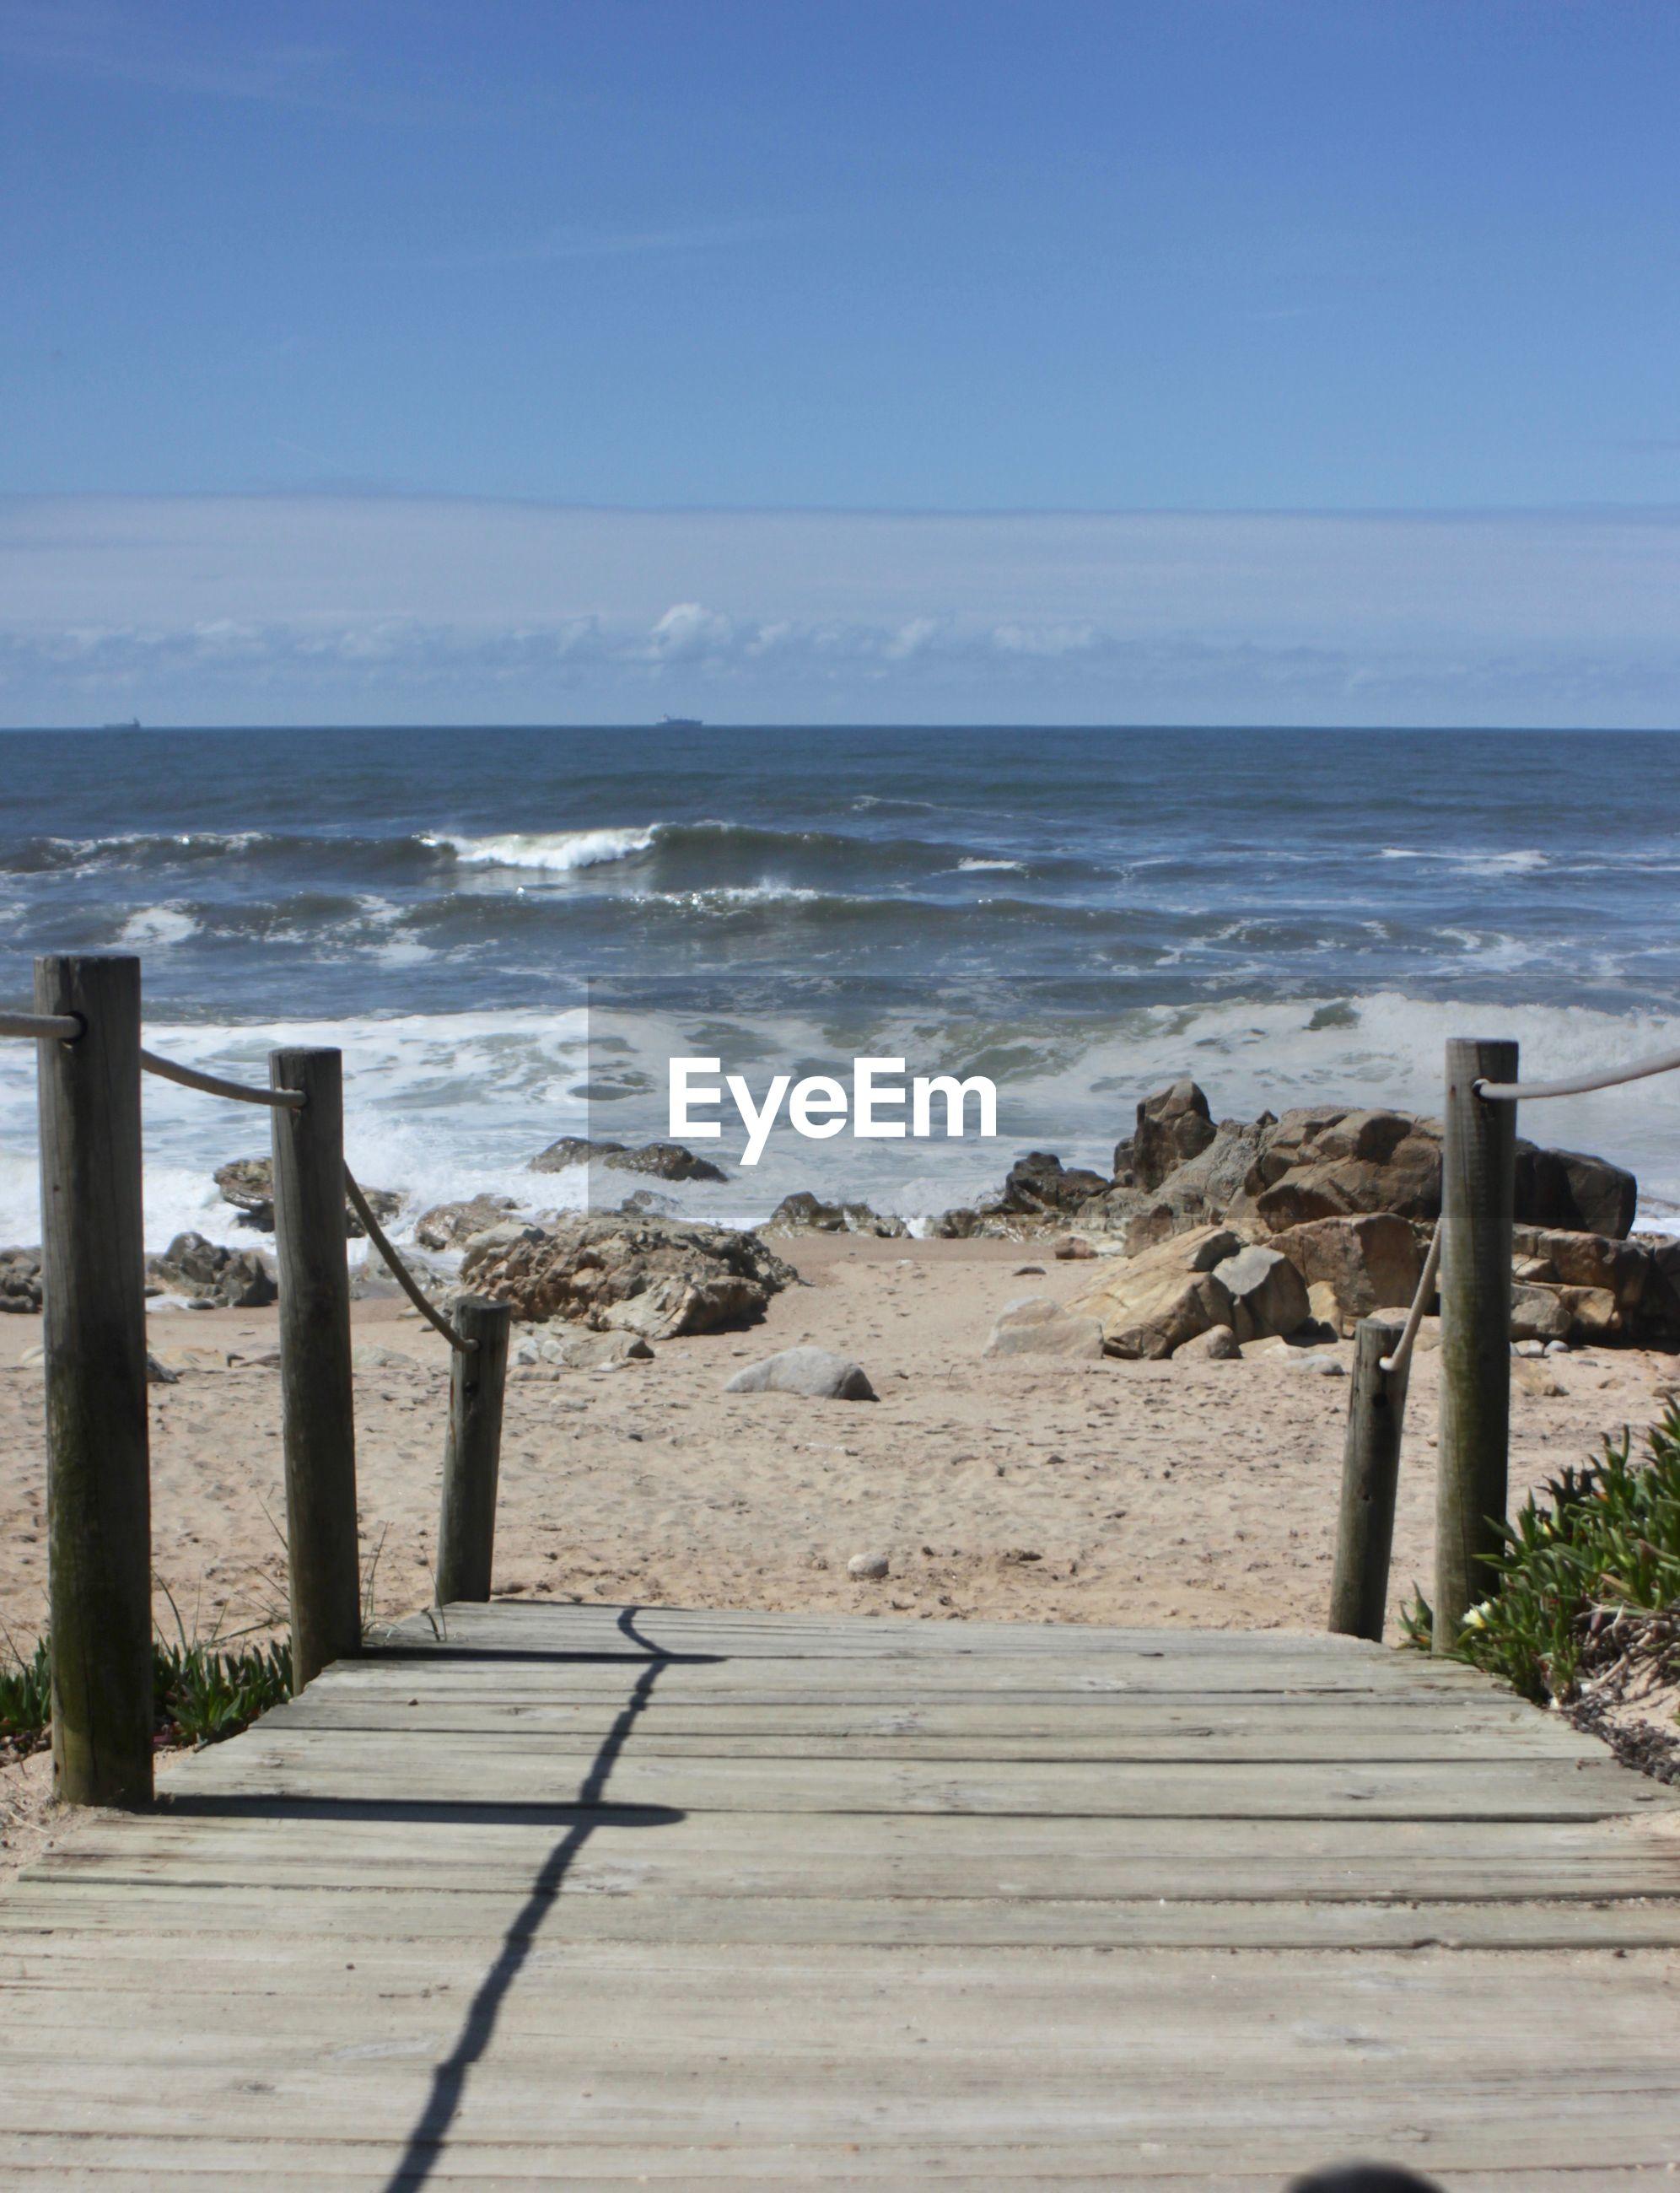 WOODEN POST ON BEACH AGAINST SKY